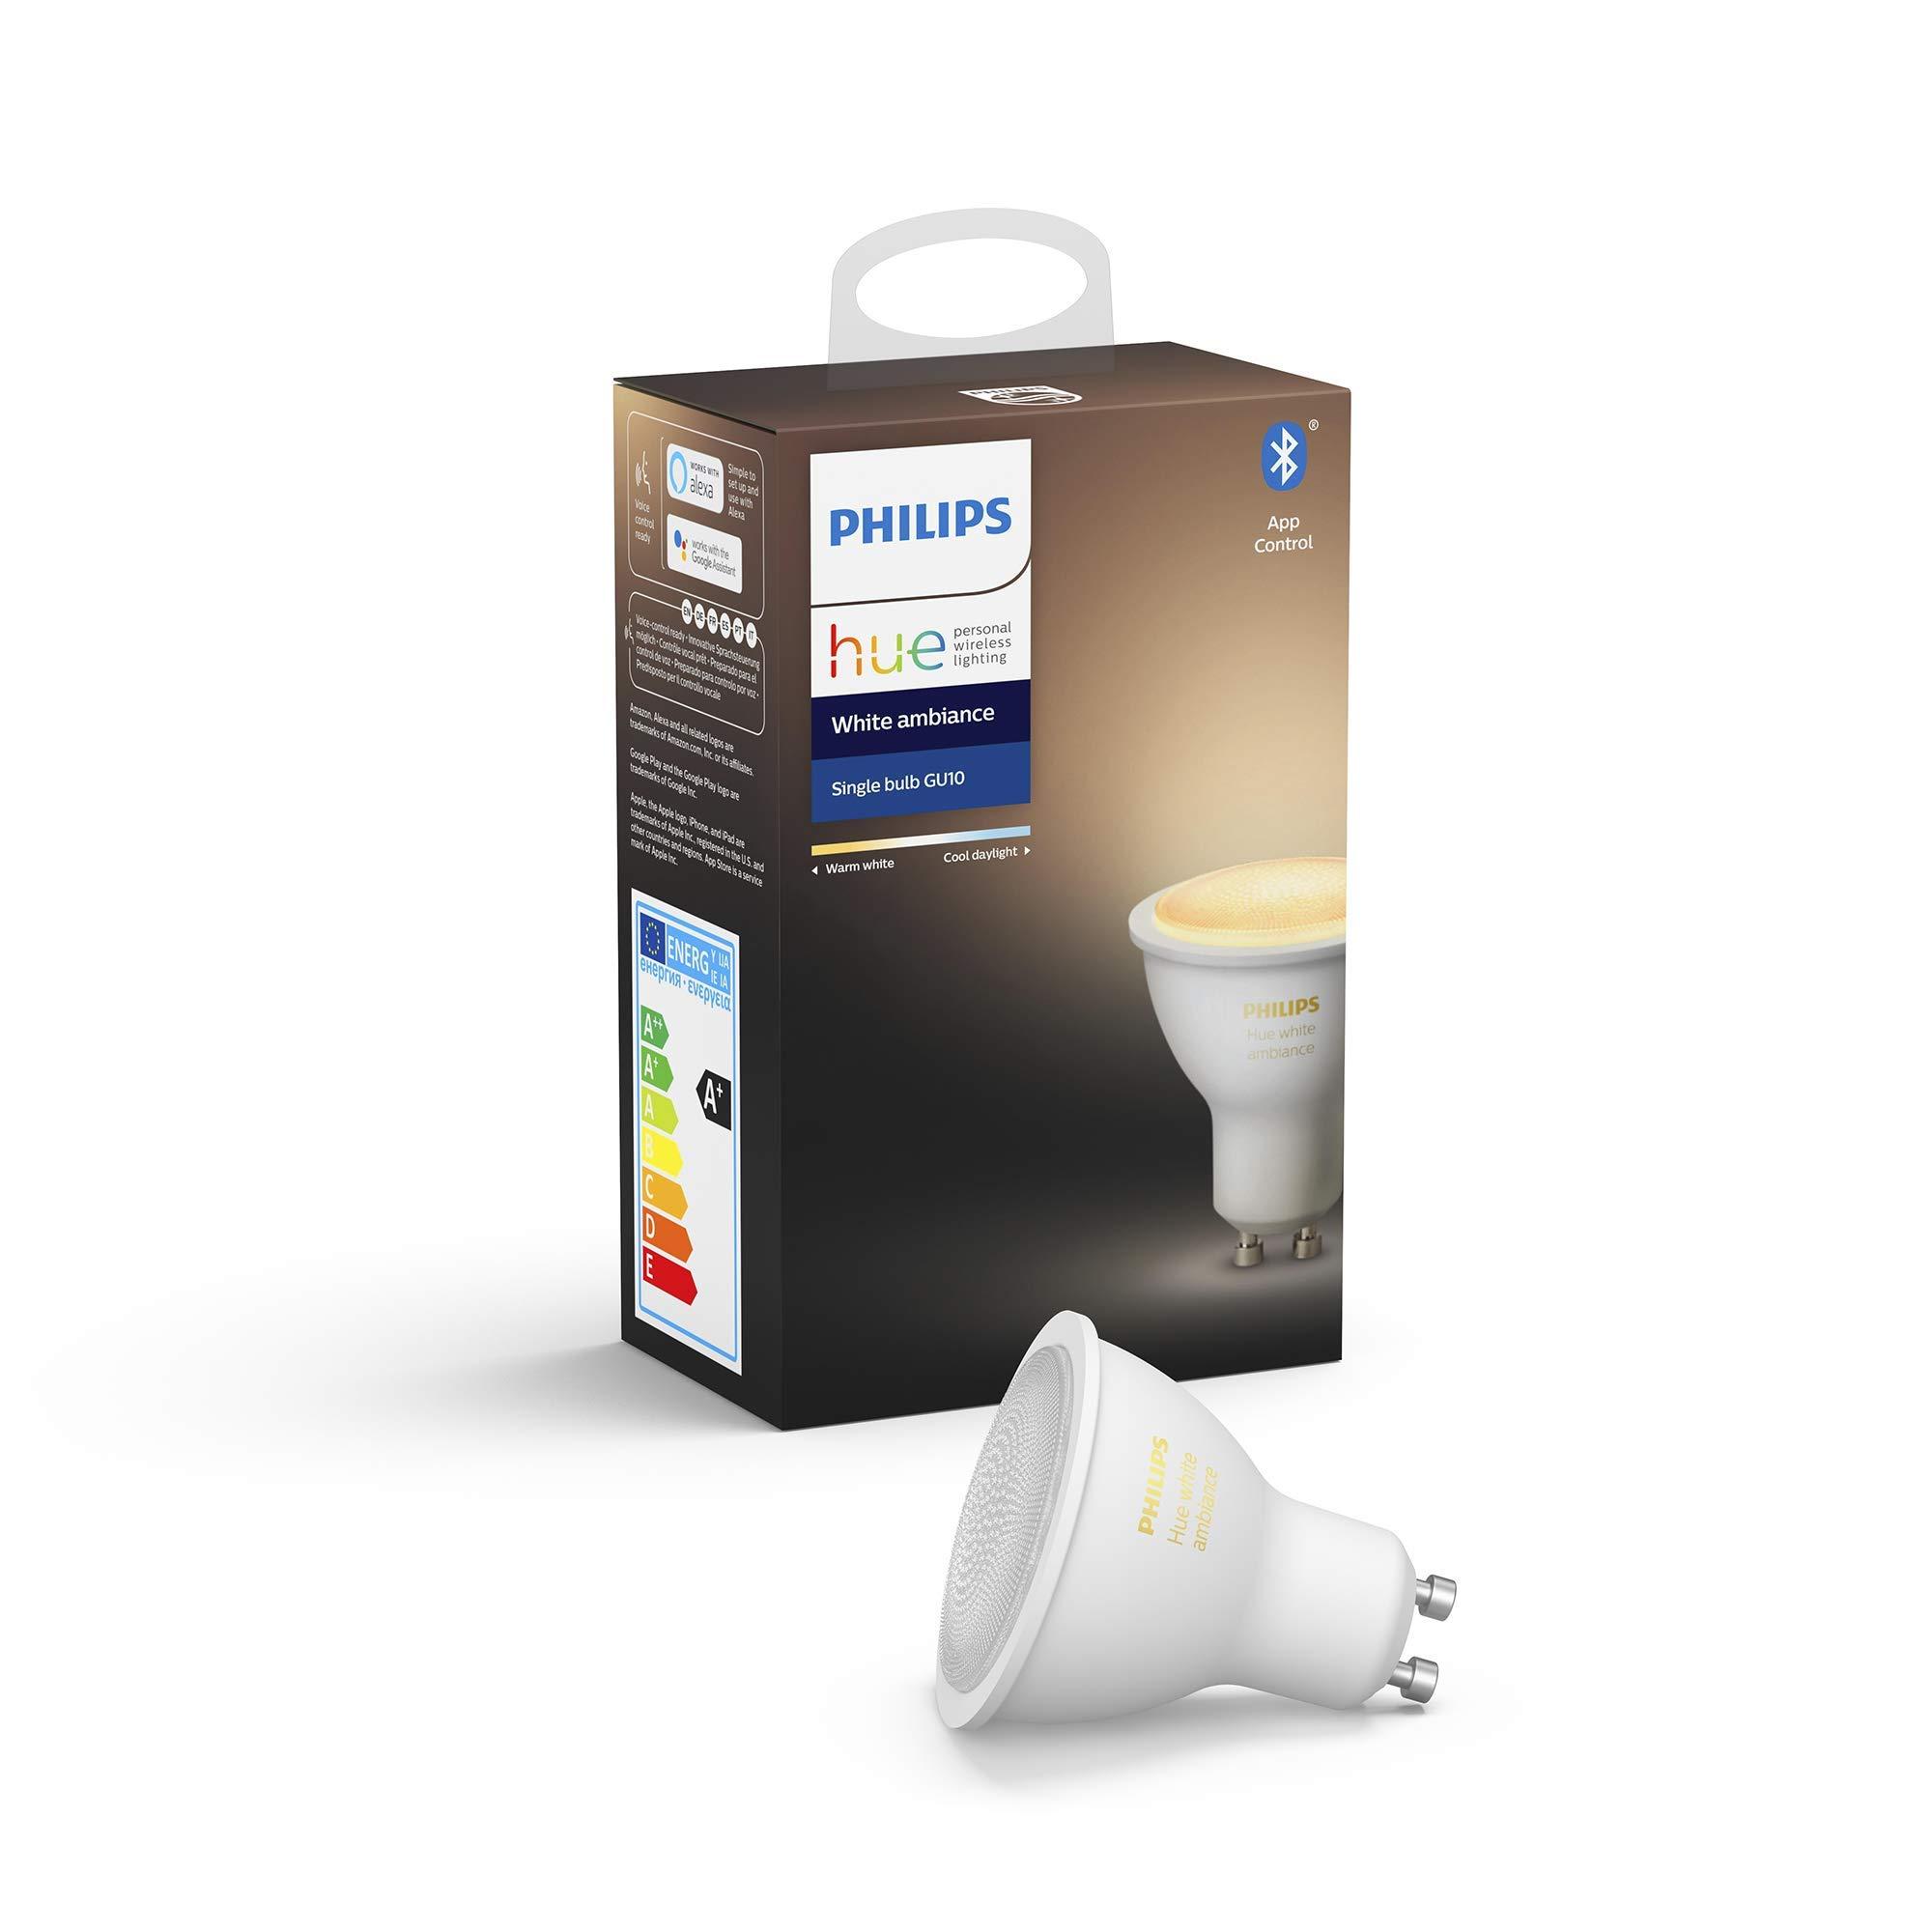 Philips Hue White Ambiance Inteligente LED GU10, con Bluetooth, Luz Blanca de Cálida a Fría, Compatible con Alexa y Google Home, 5 W, 1 Bombilla